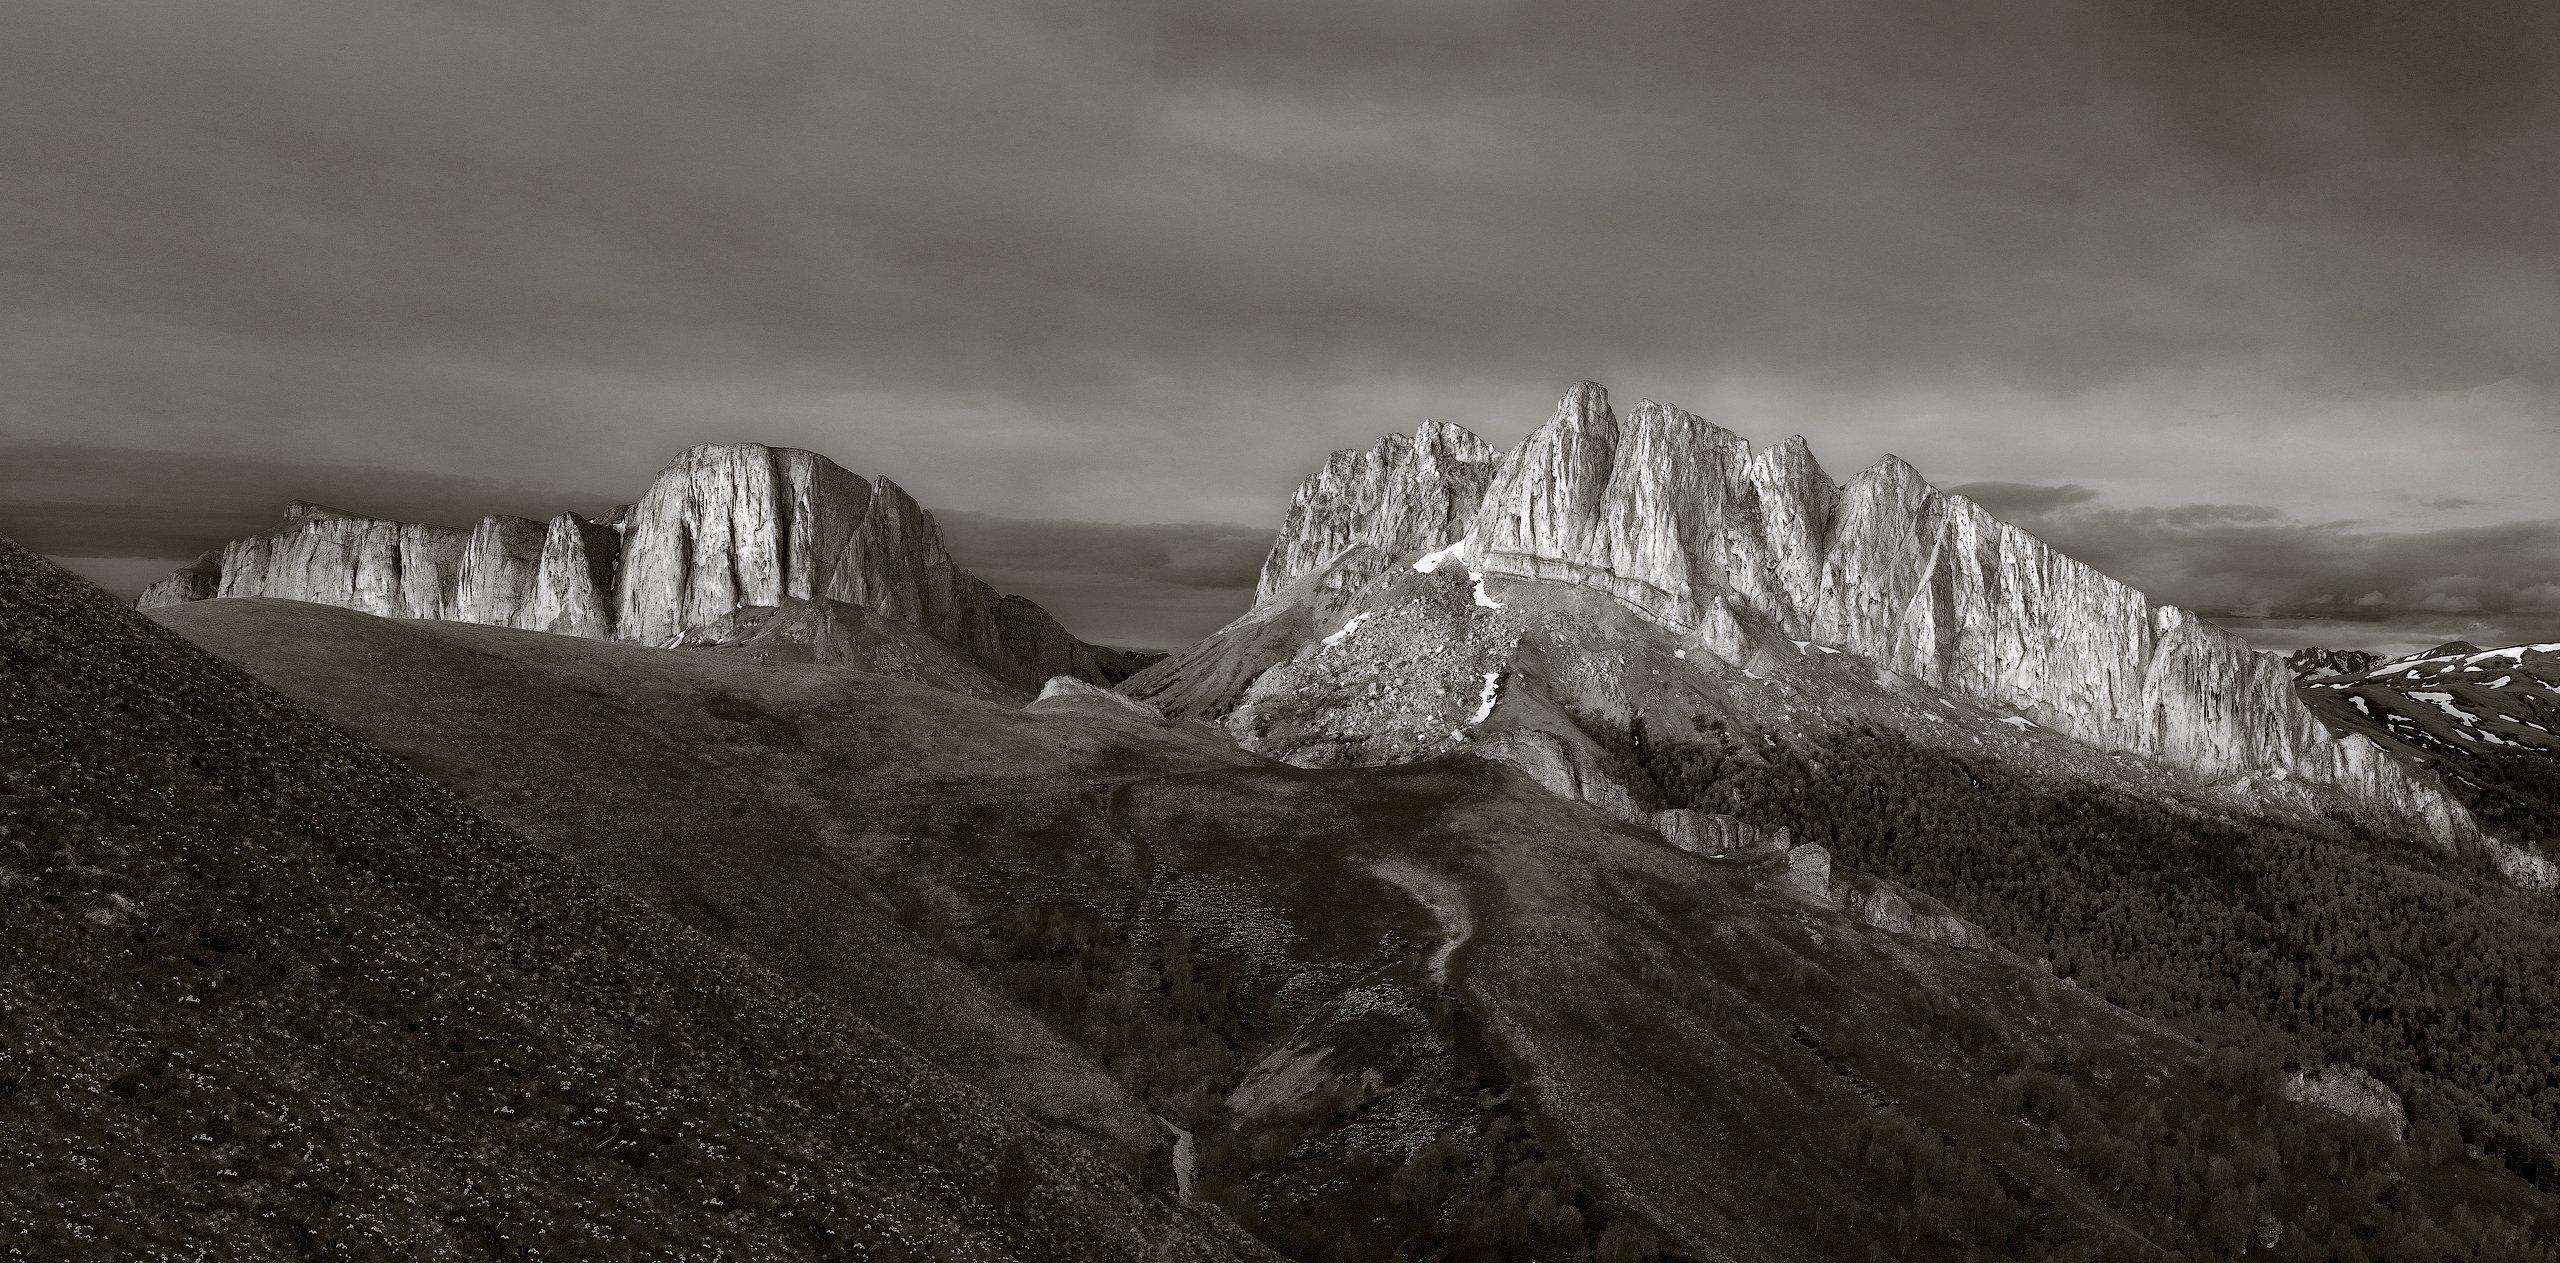 панорама, Александр Плеханов